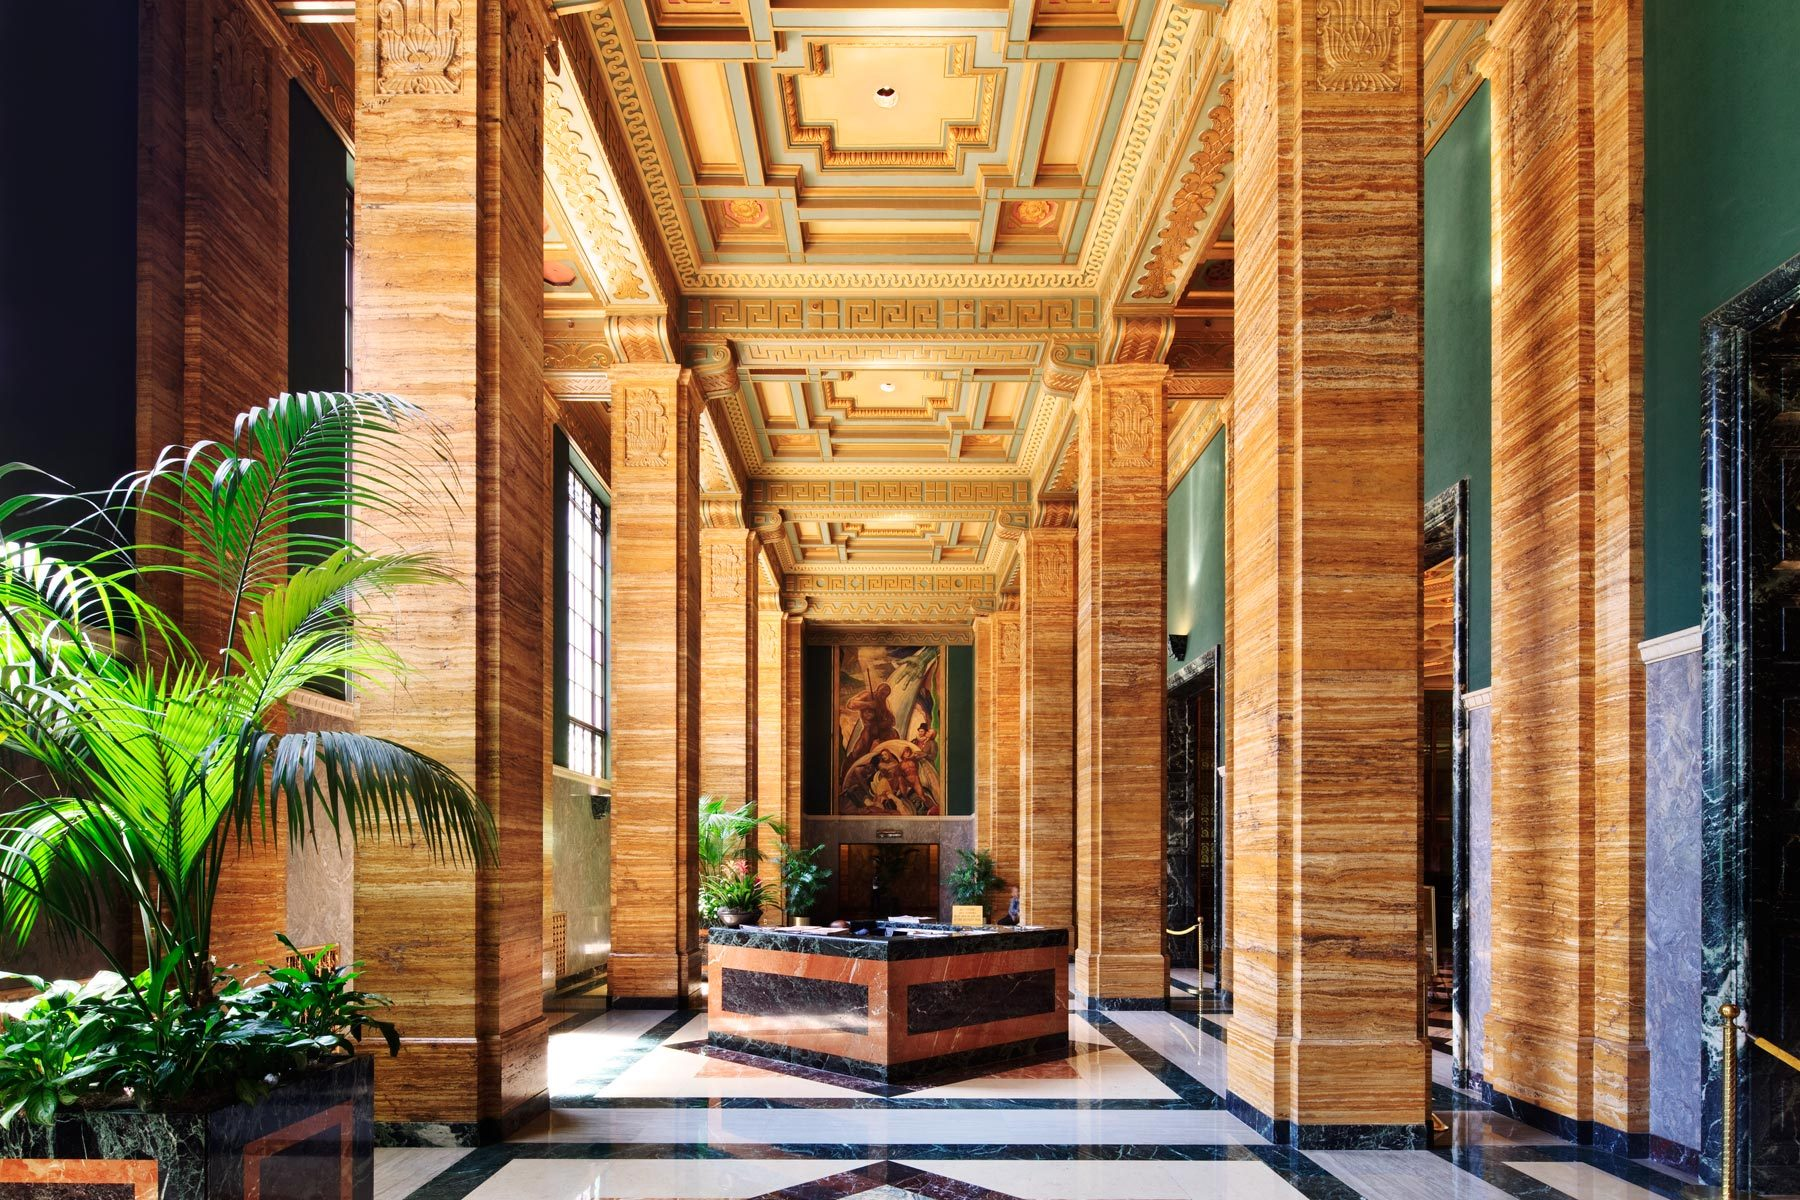 One Bunker Hill Art Deco Lobby -Image courtesy:  dtlaexplorer.wordpress.com